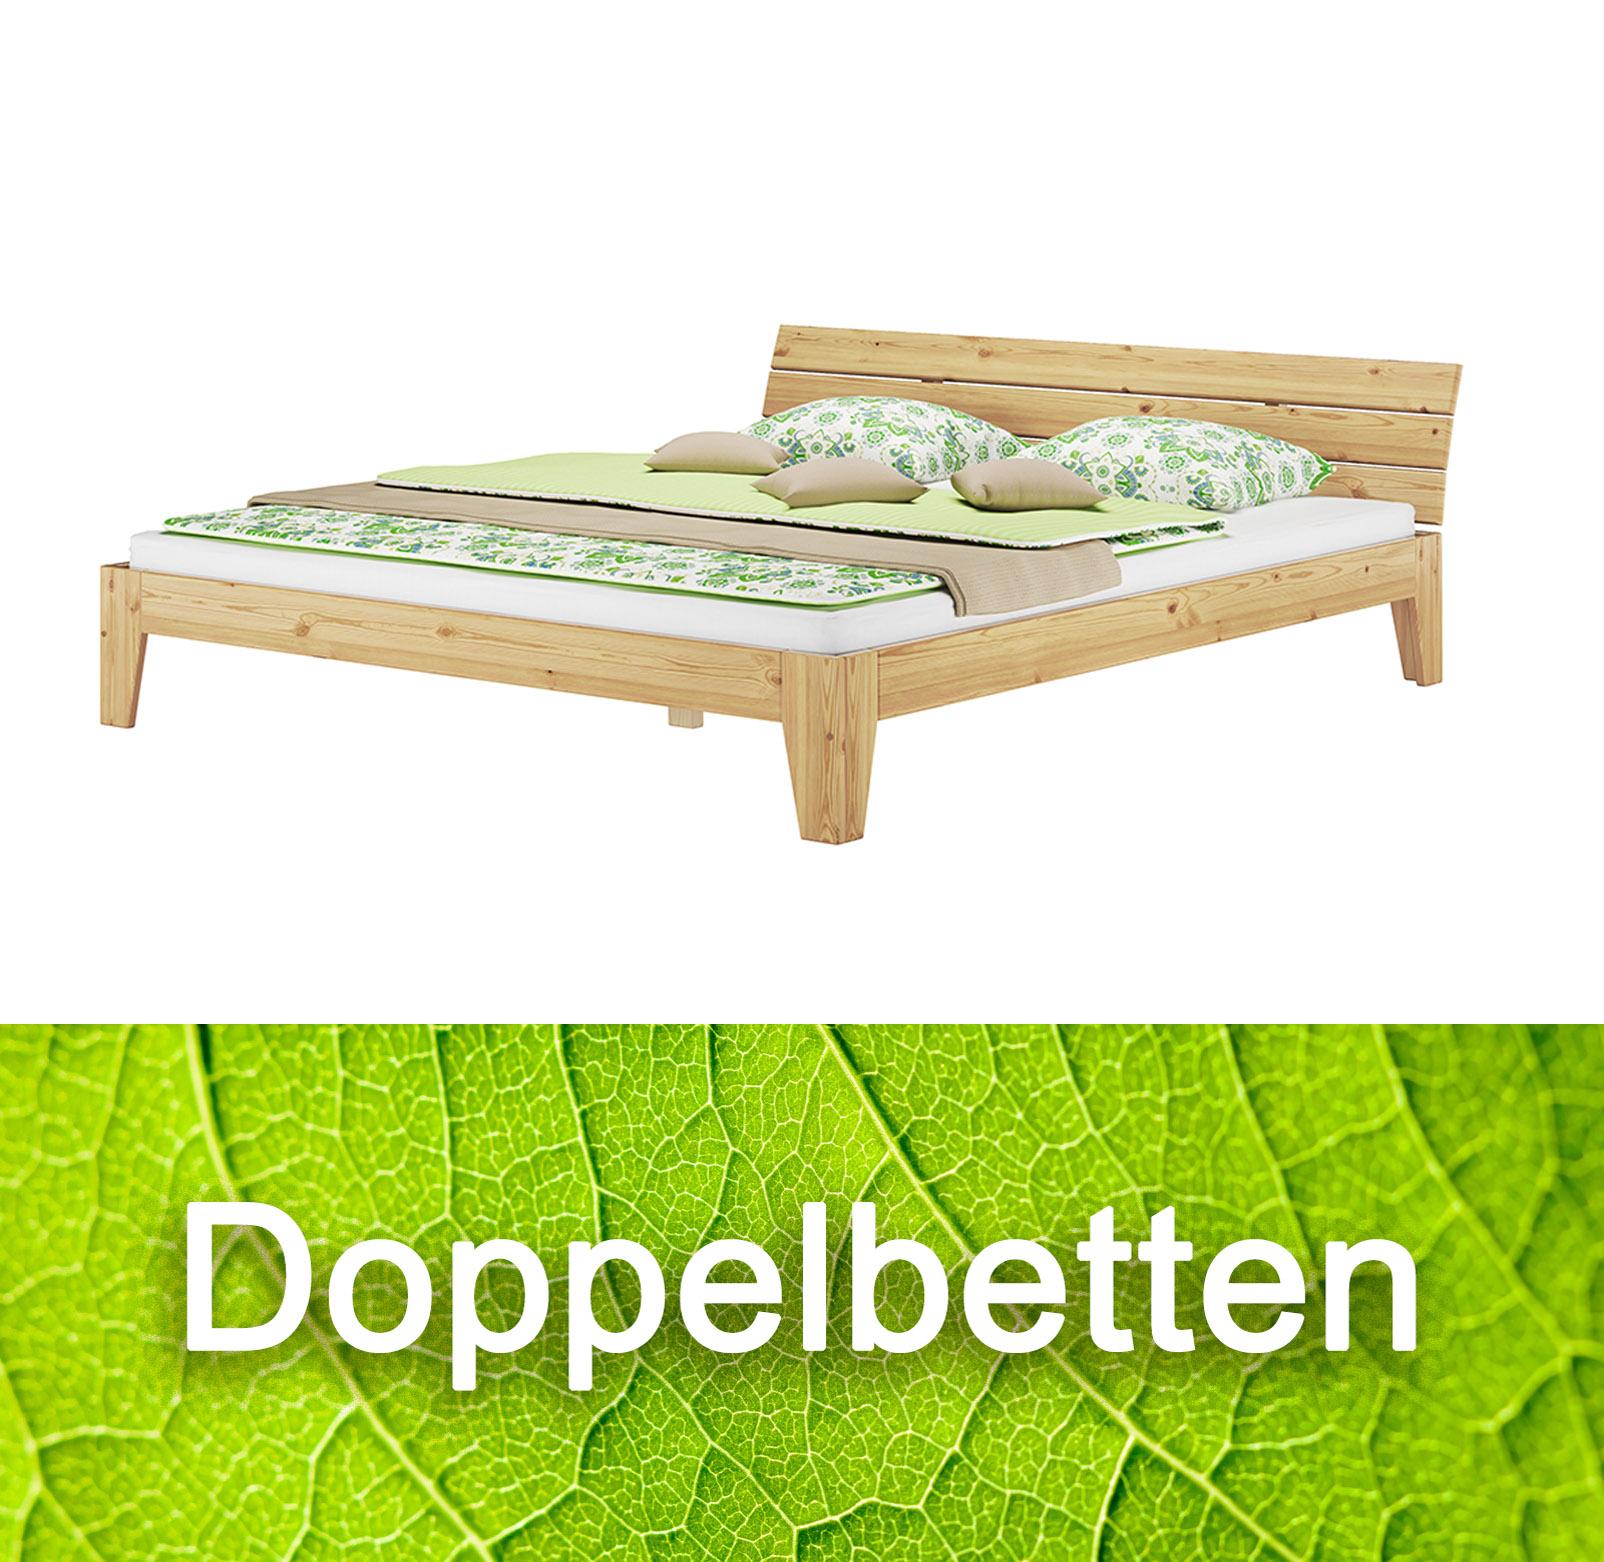 Doppelbetten